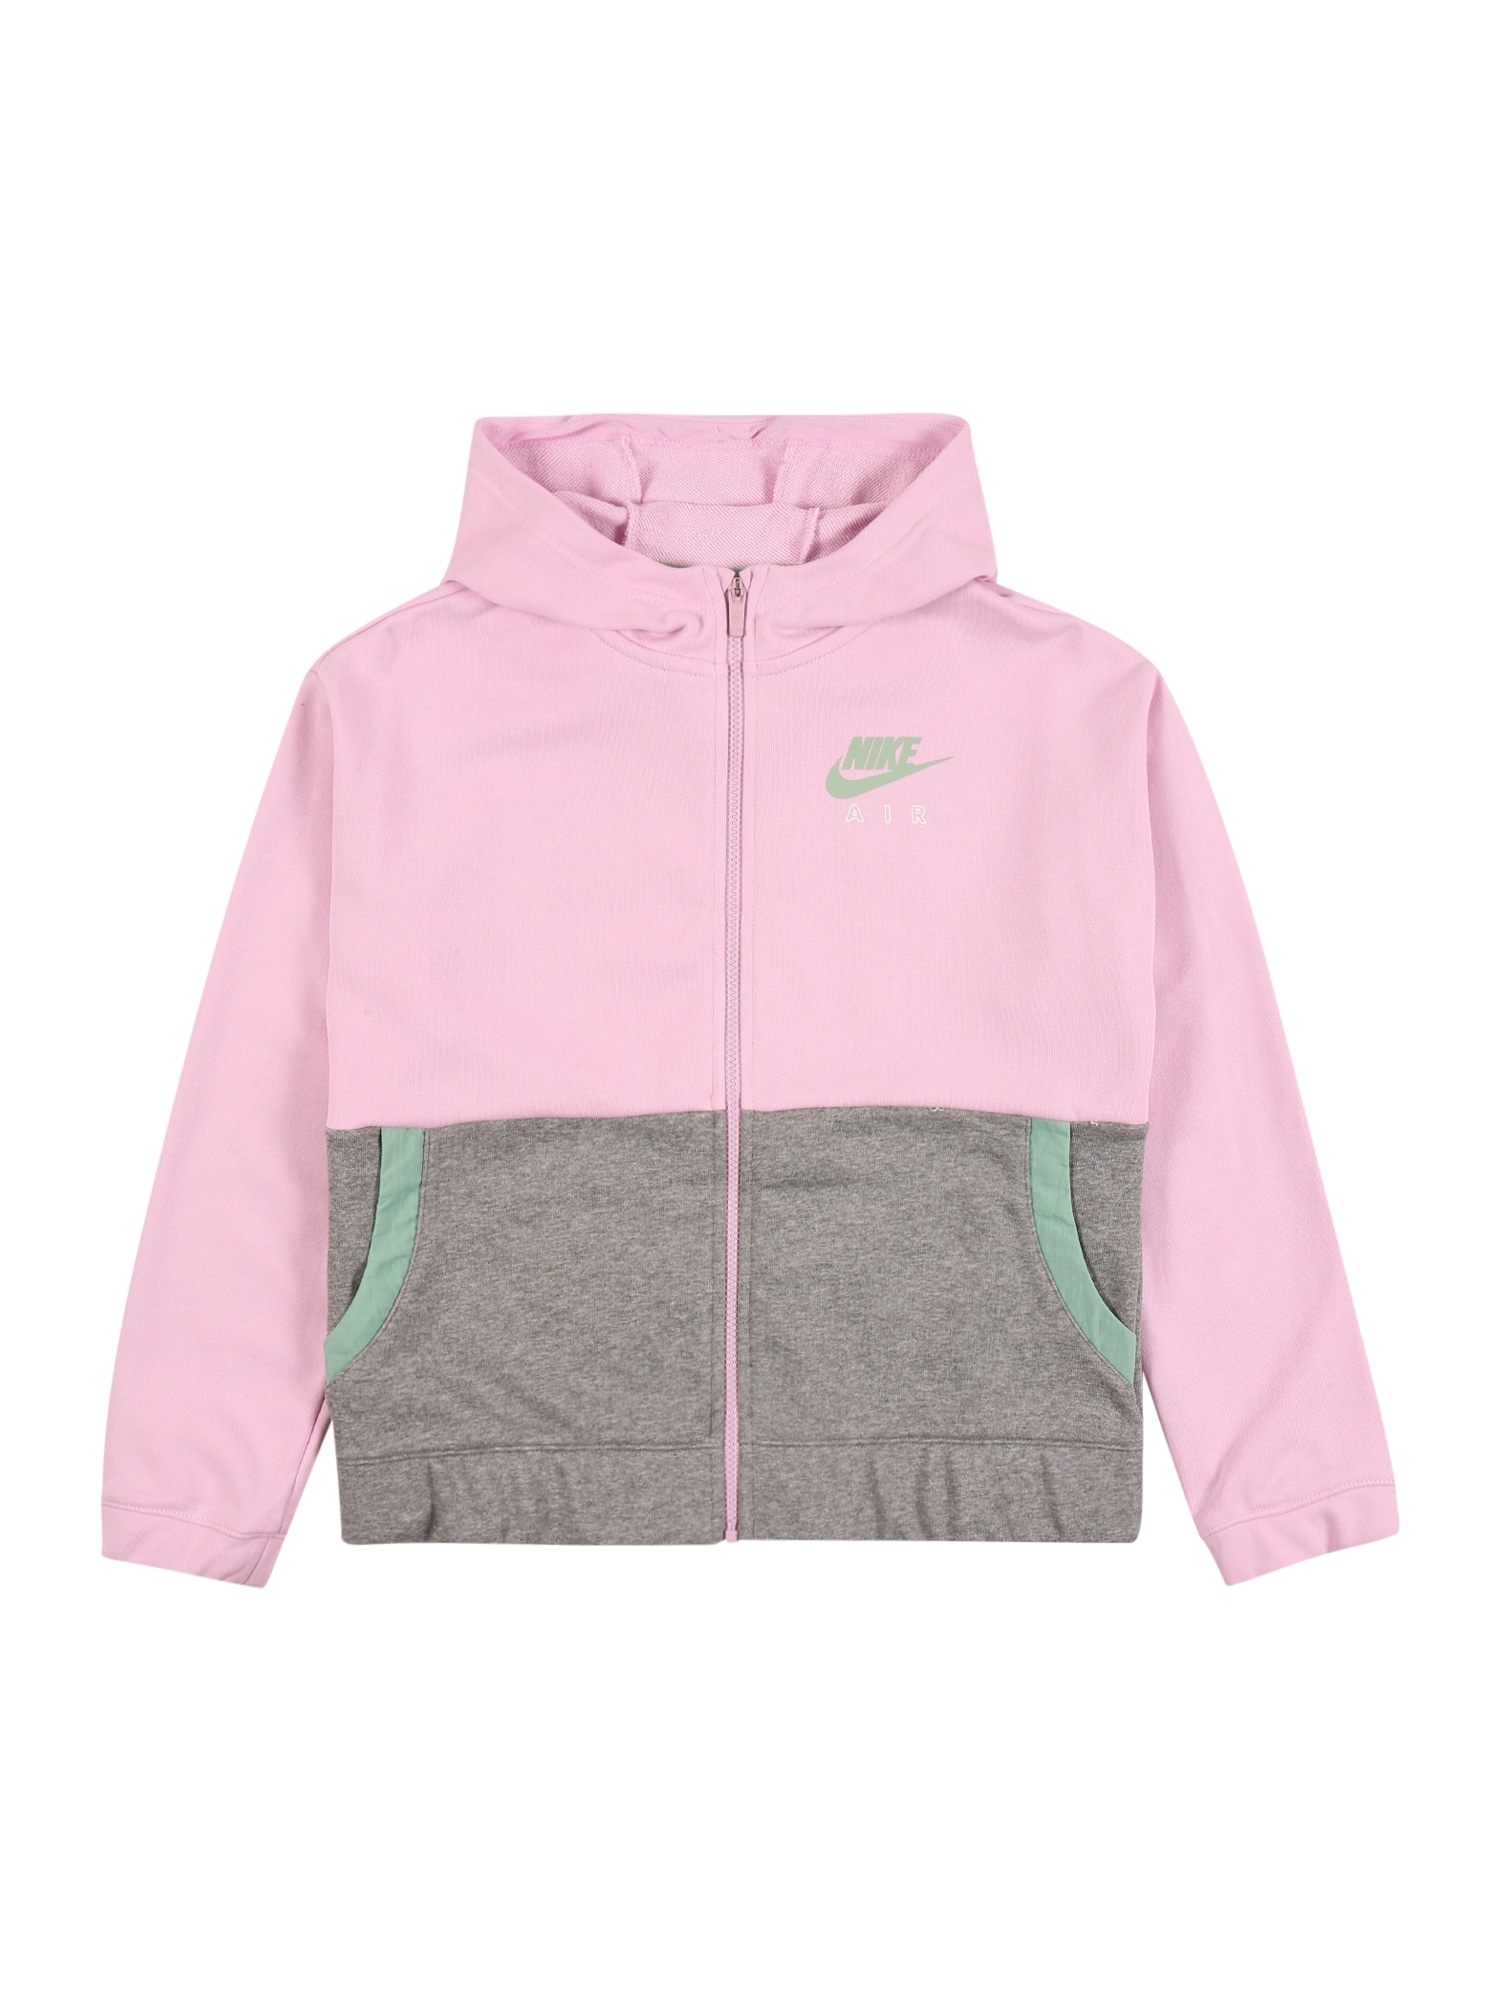 Nike Sportswear Tepláková bunda 'Air'  sivá / mätová / ružová